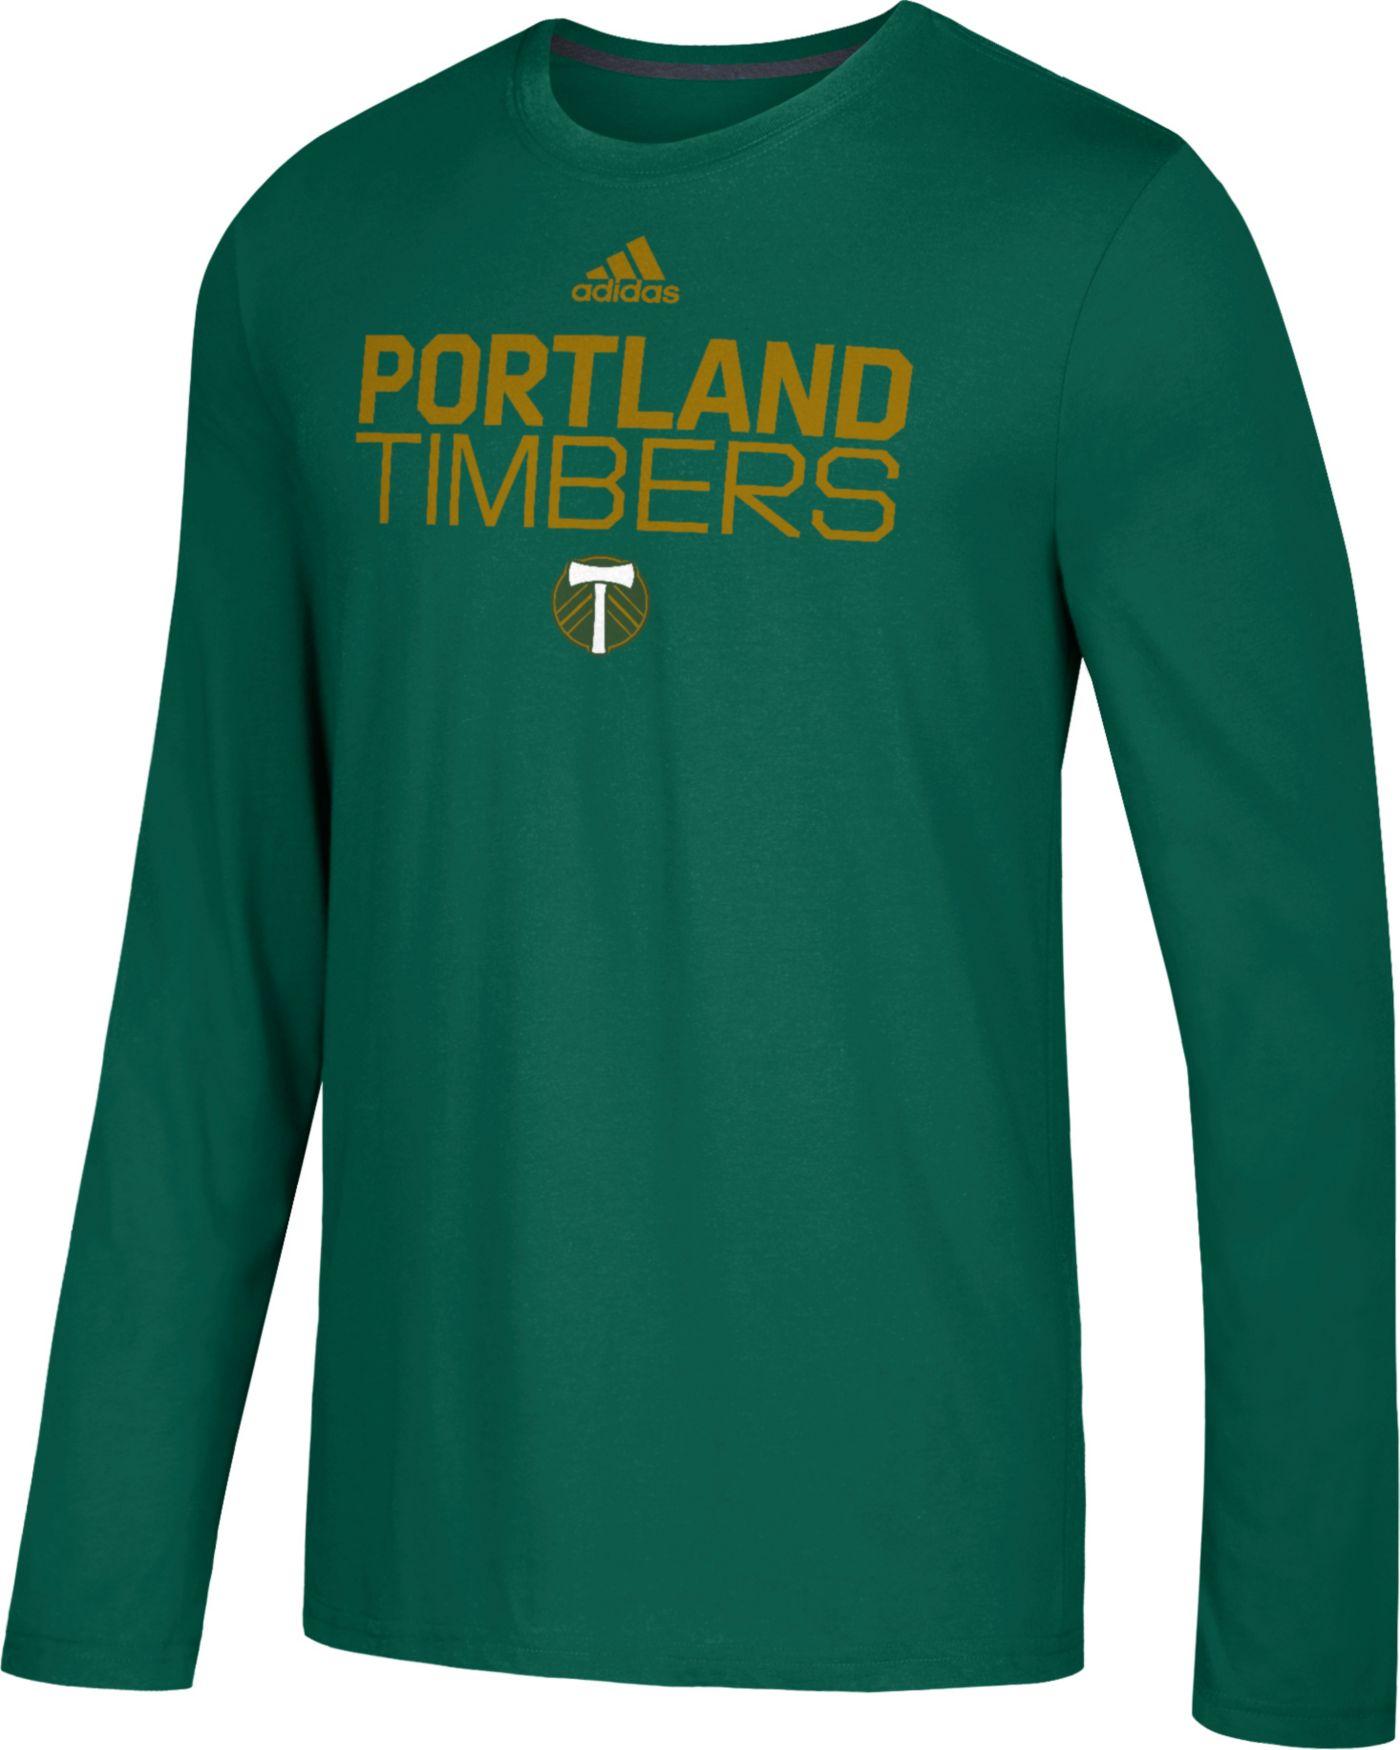 adidas Men's Portland Timbers Logo Performance Green Long Sleeve Shirt